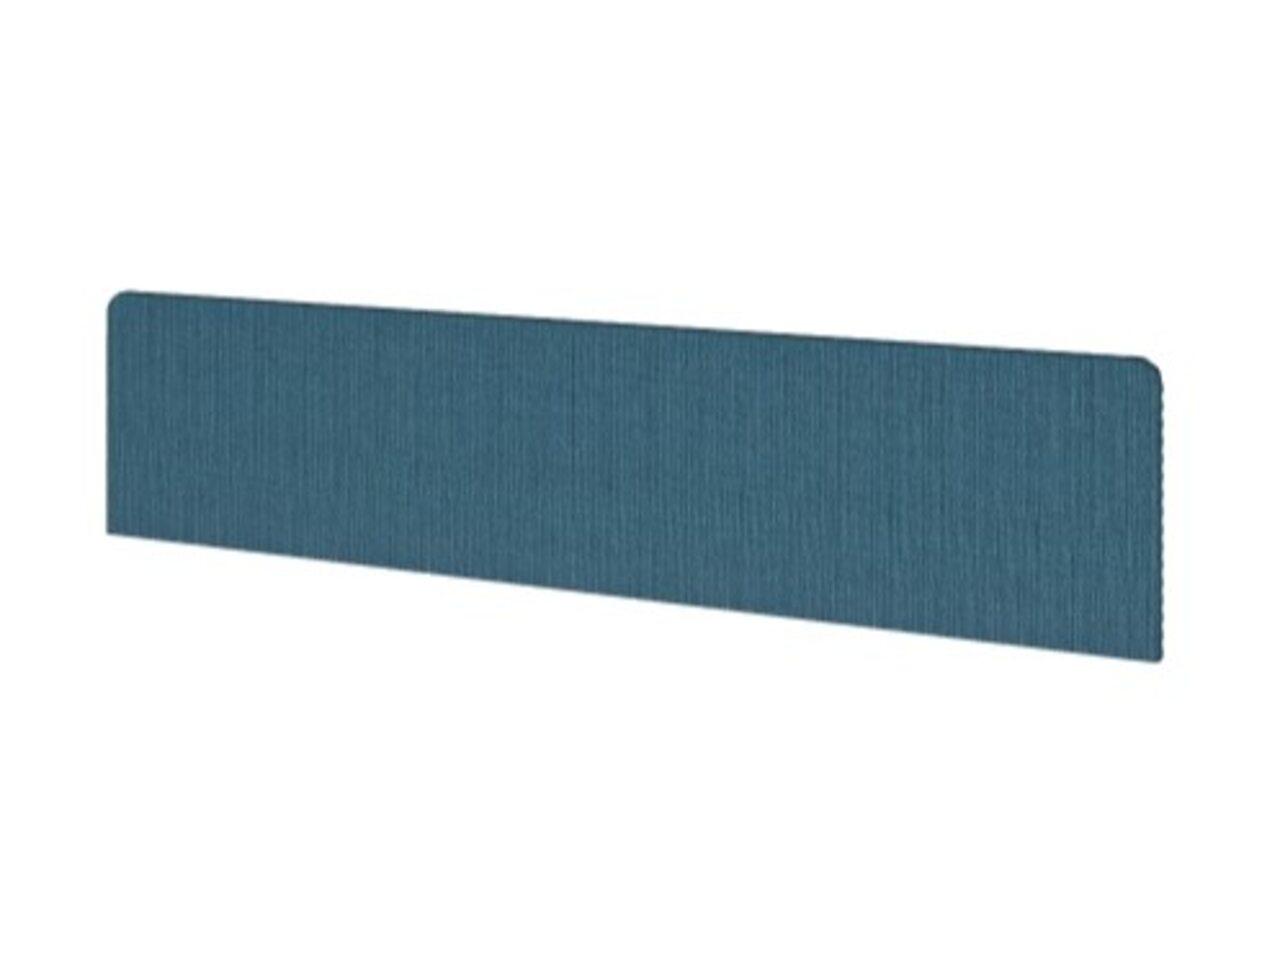 Экран ЛДСП в тканевом чехле  Vasanta 160x4x37 - фото 1